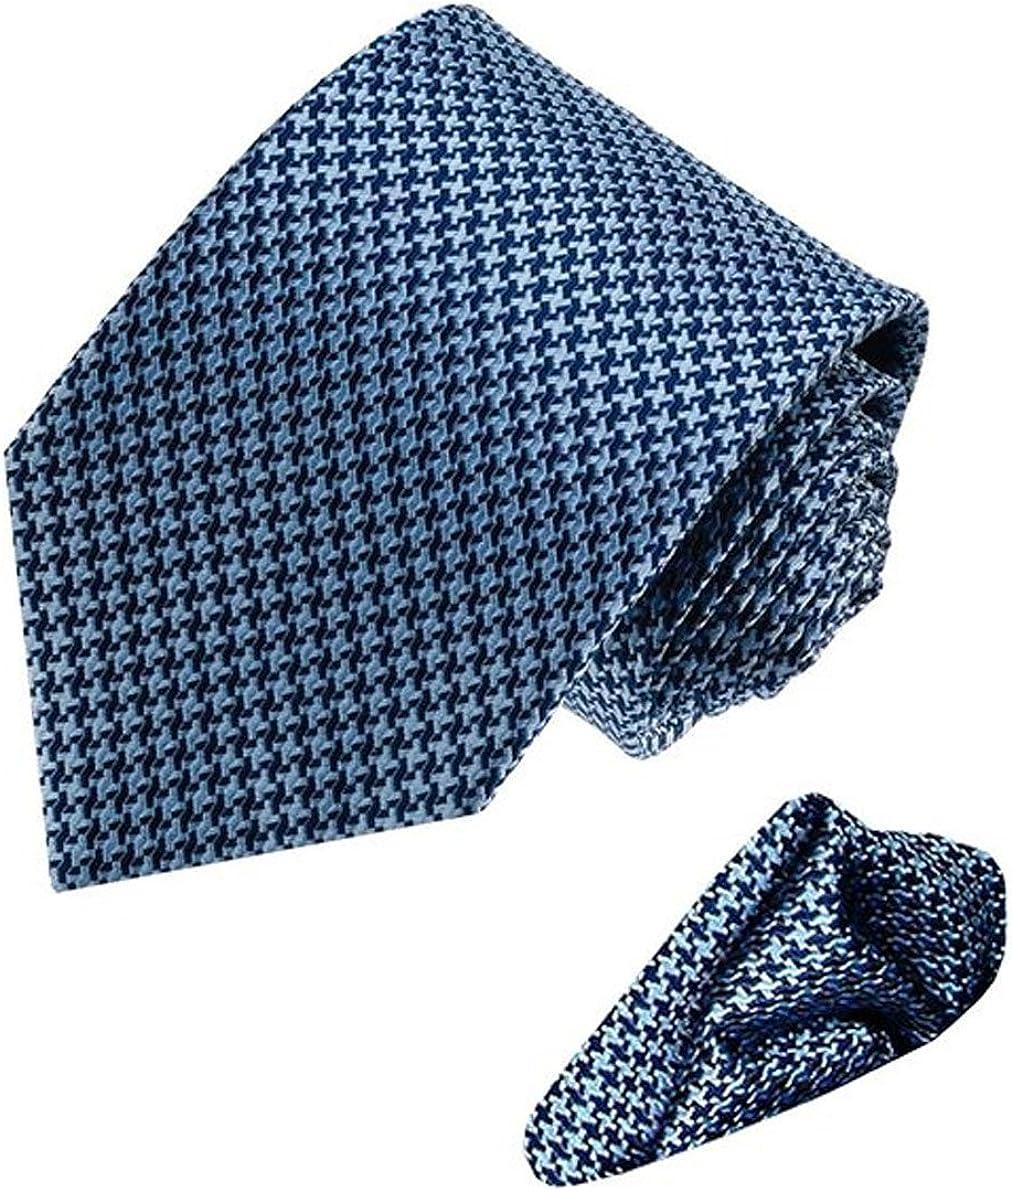 LORENZO CANA Italian 100% Silk Tie Hanky Set Blue Lightblue Patterned 8449501